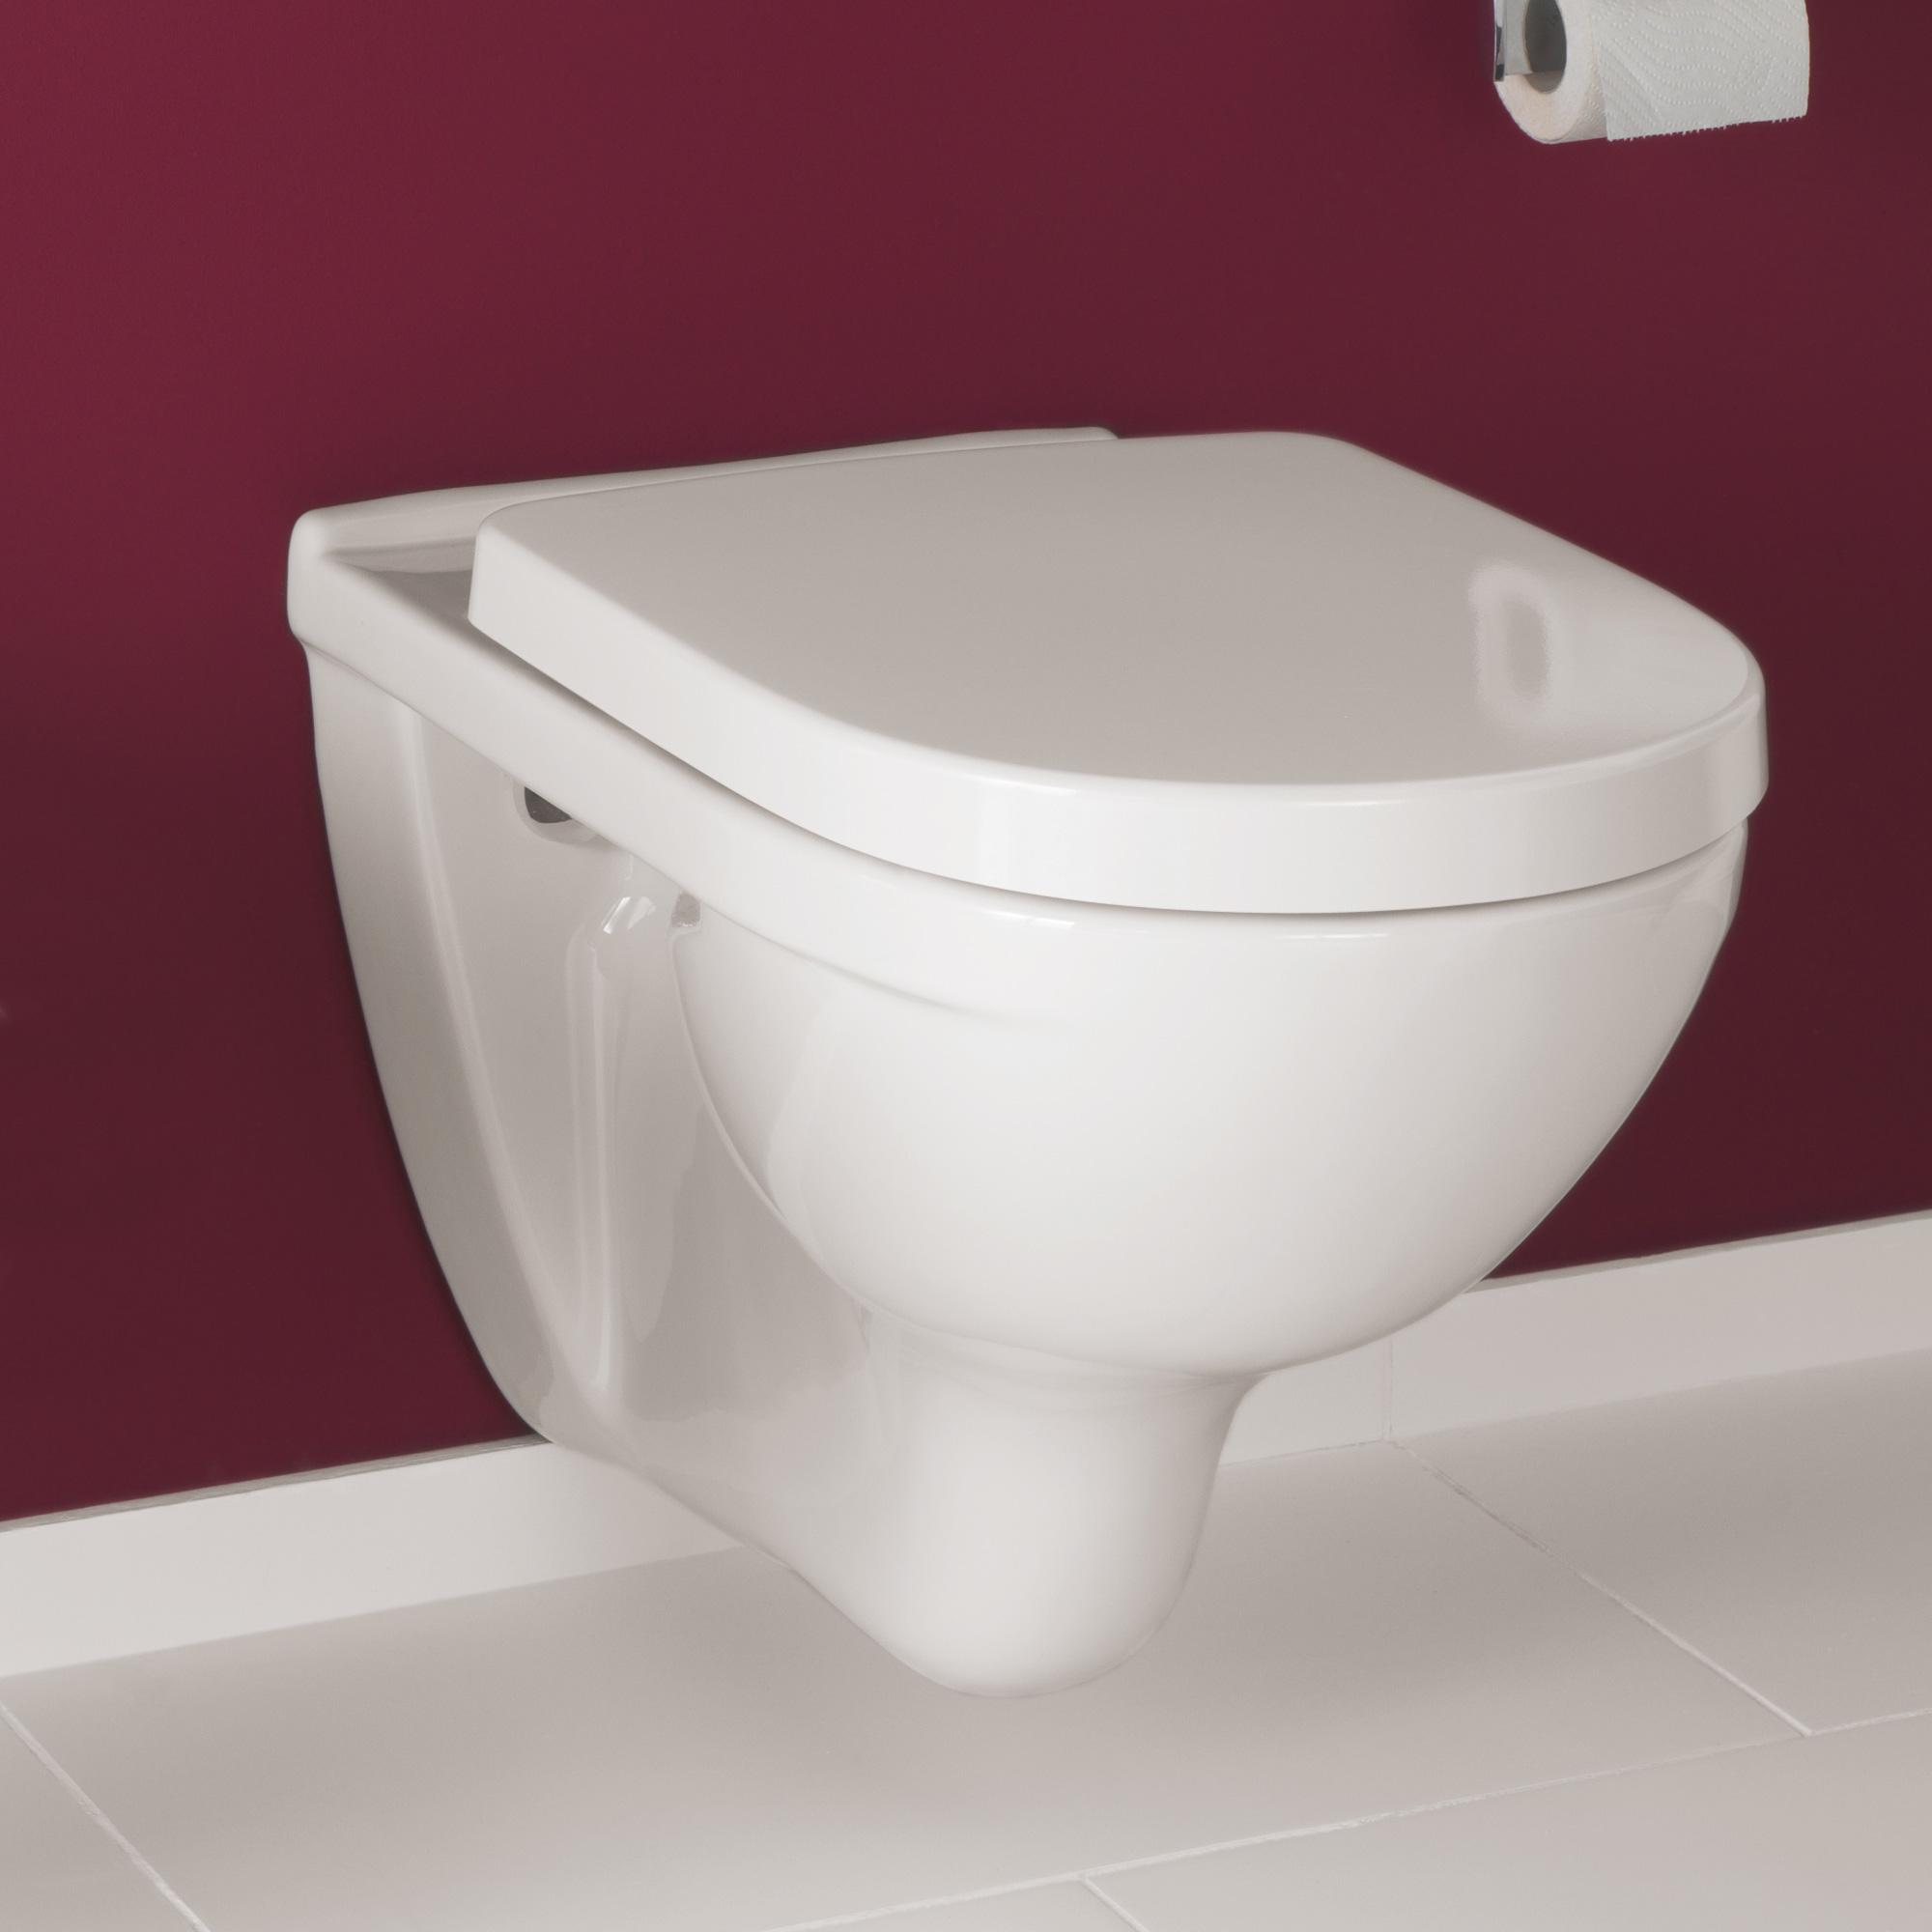 villeroy boch wand tiefsp l wc l 56 b 36 cm wei. Black Bedroom Furniture Sets. Home Design Ideas